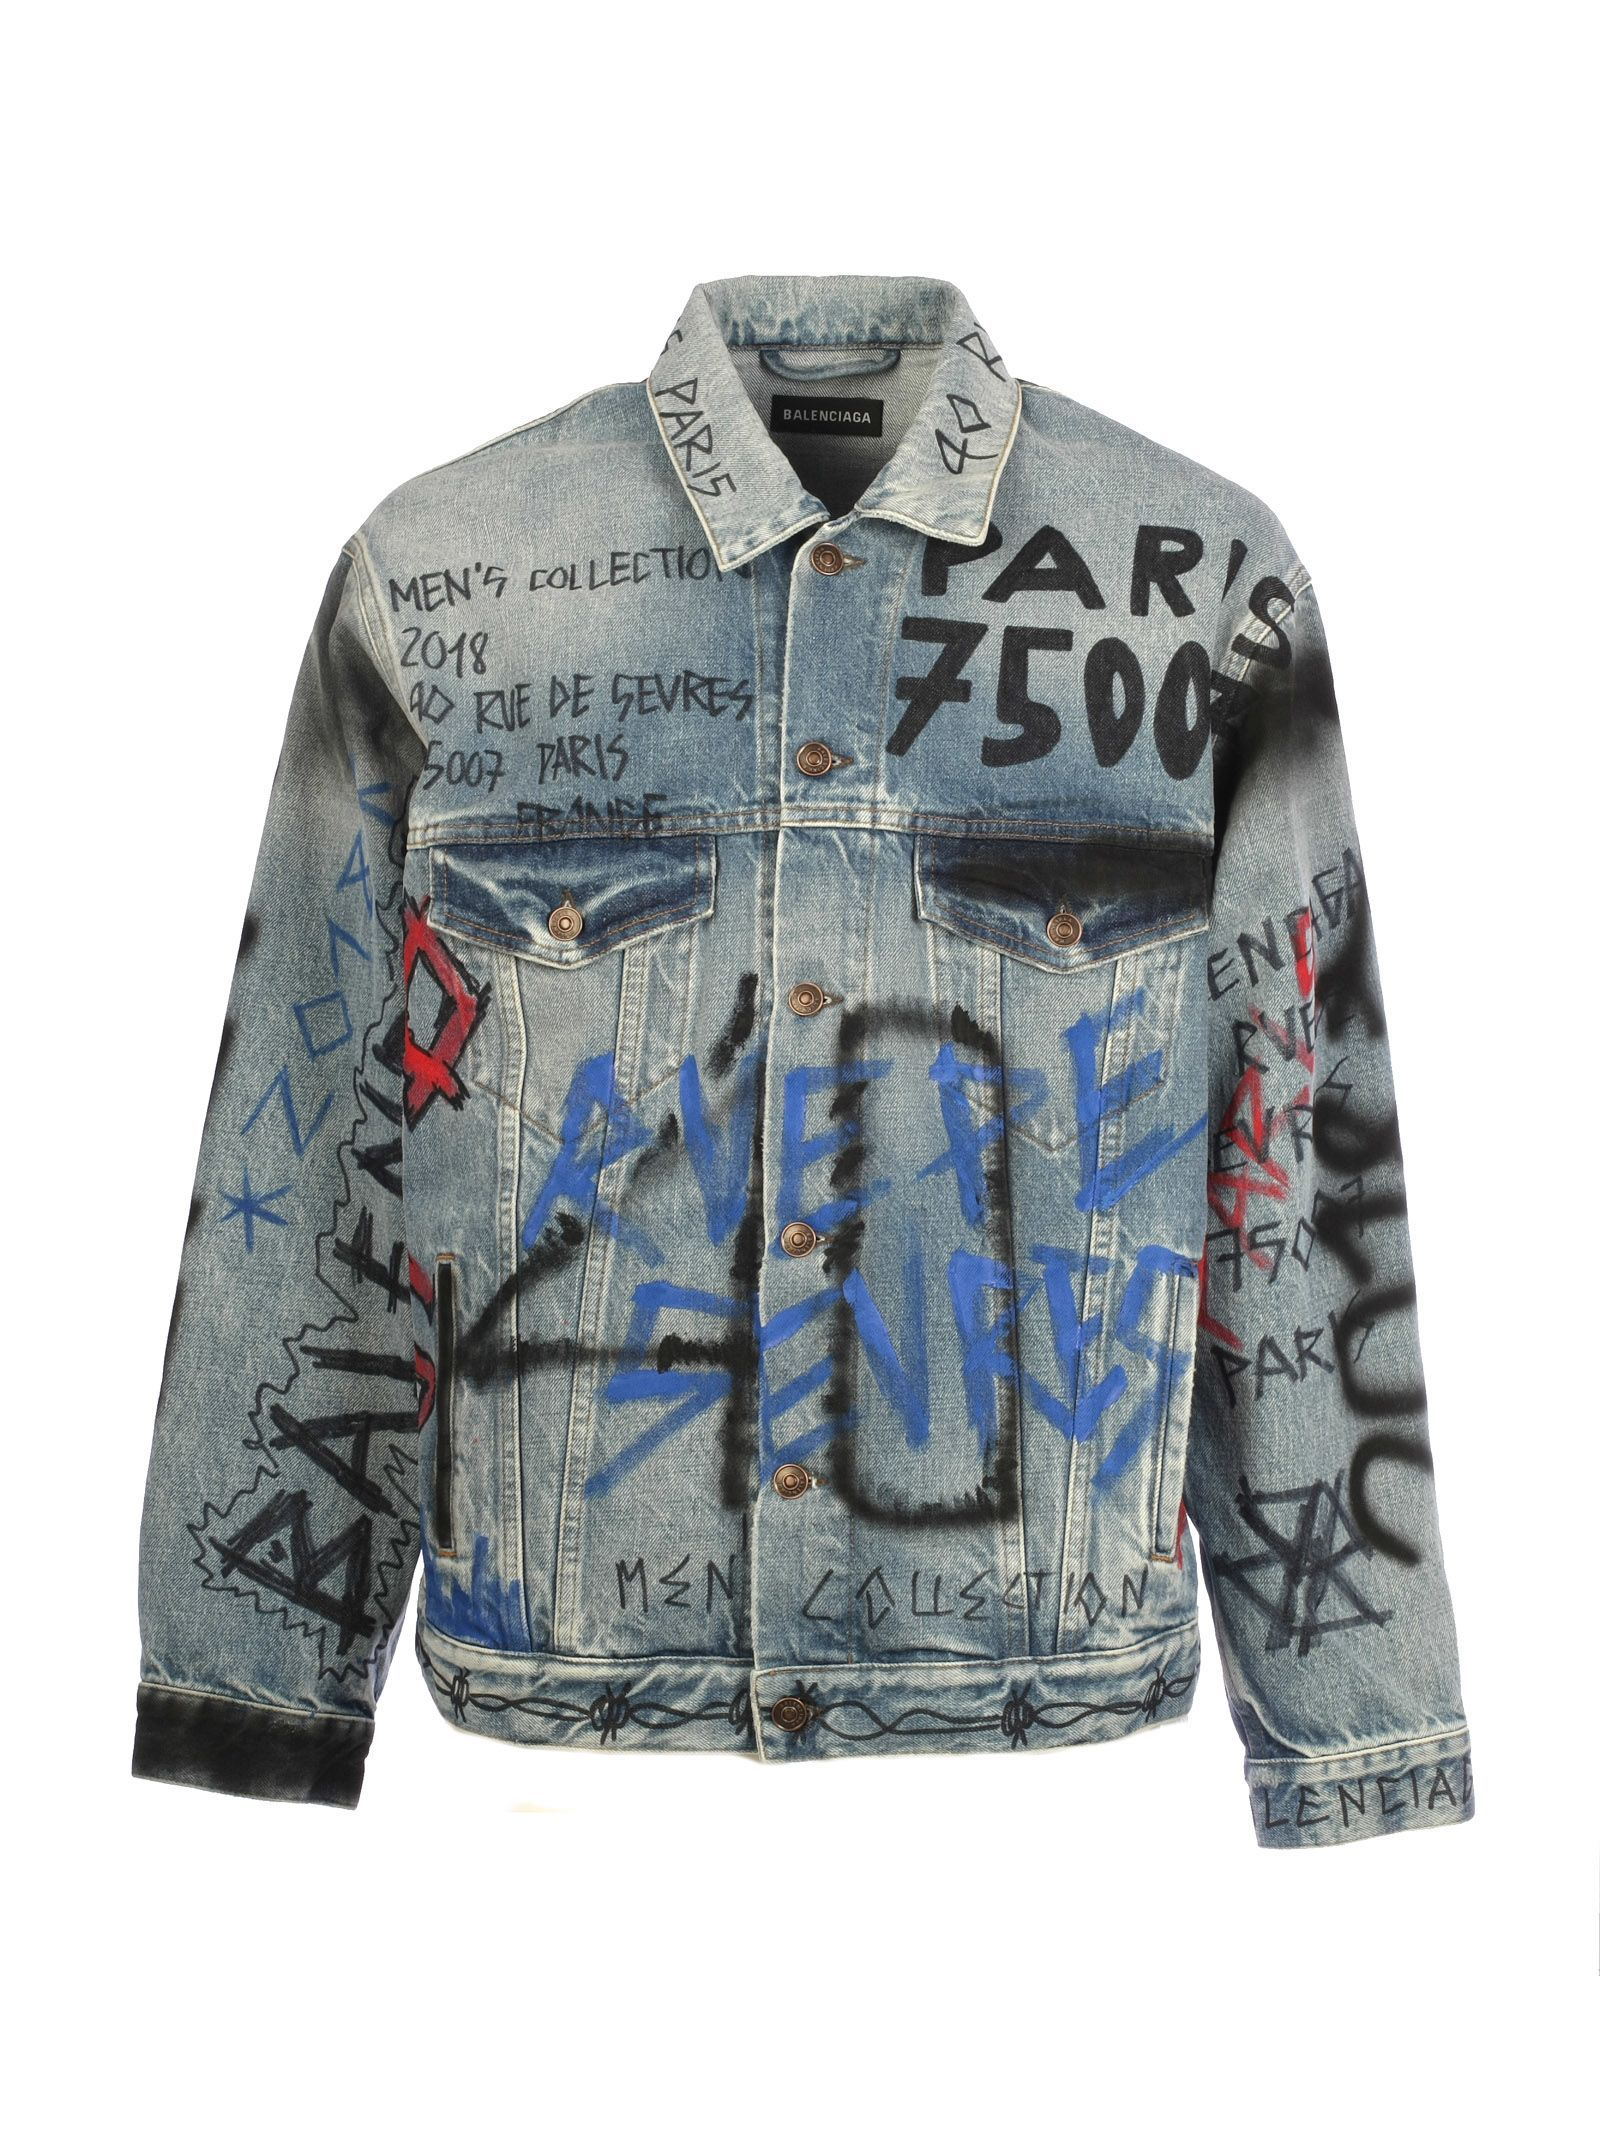 graffiti clothing art women/'s denim coat denim coat- jacket coat art on clothes jeans coat hippie coat denim graffiti jacket